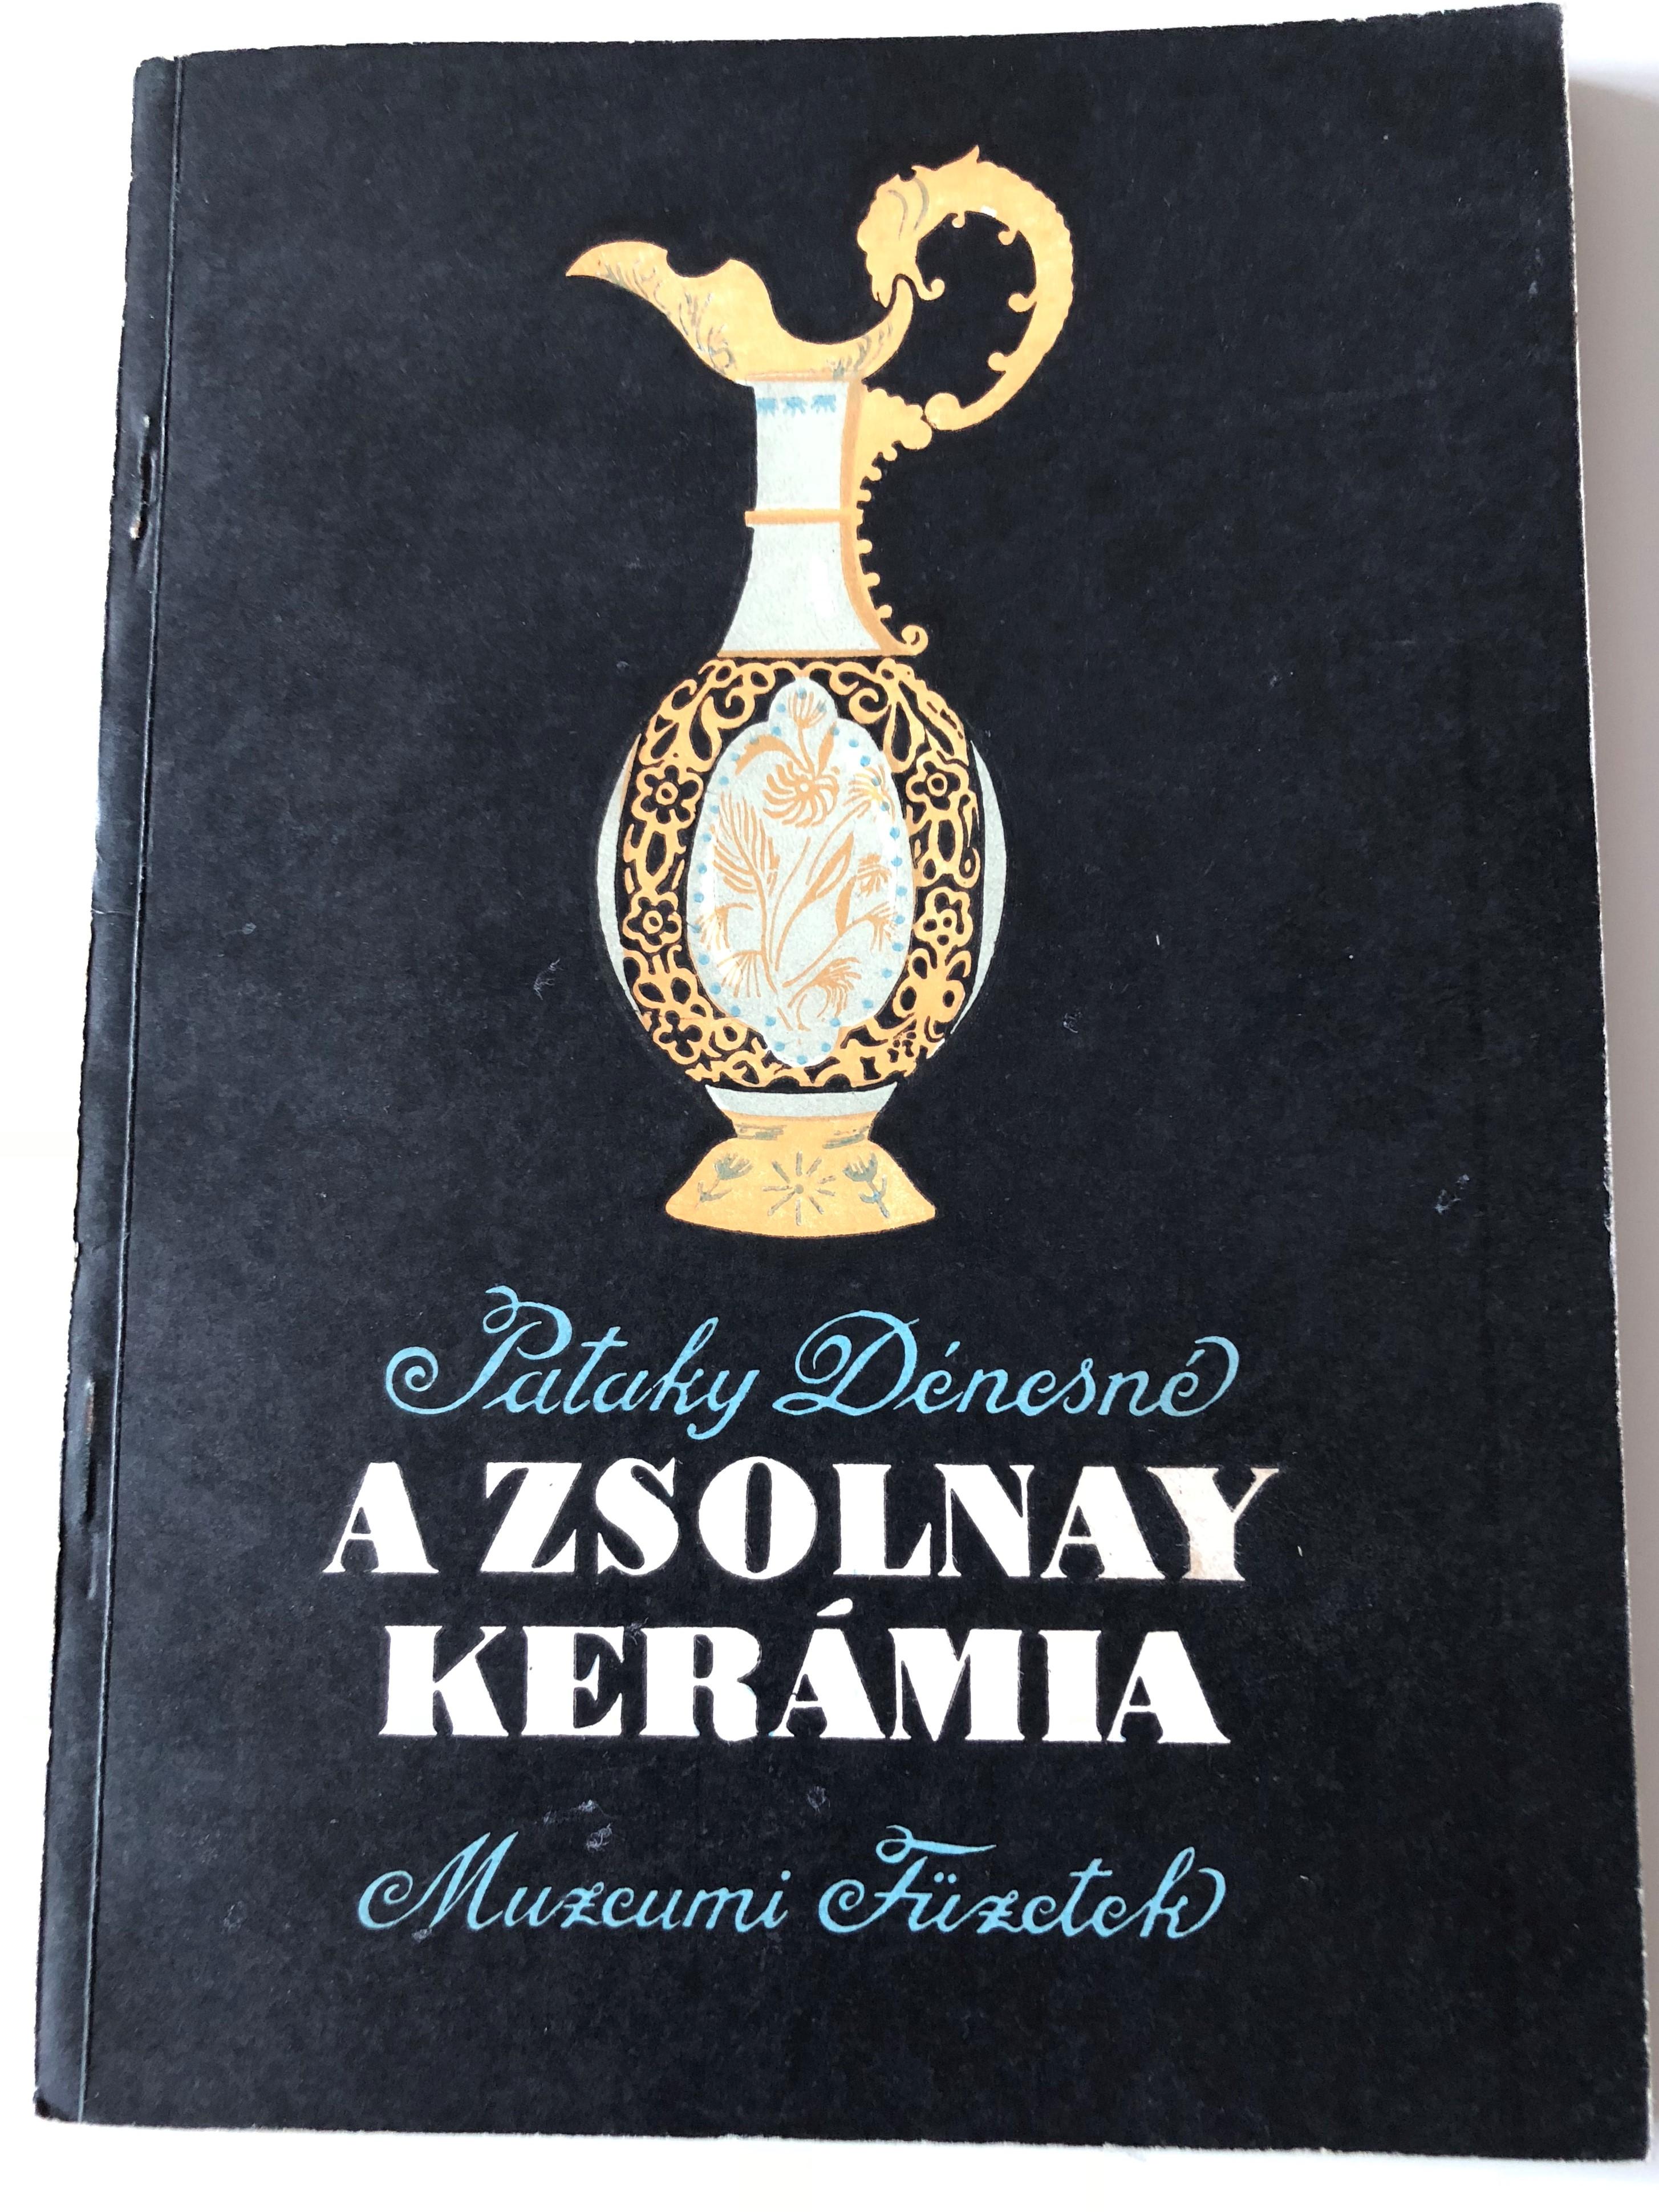 a-zsolnay-ker-mia-the-zsolnay-ceramics-dr.-pataky-d-nesn-m-zeum-1-.jpg